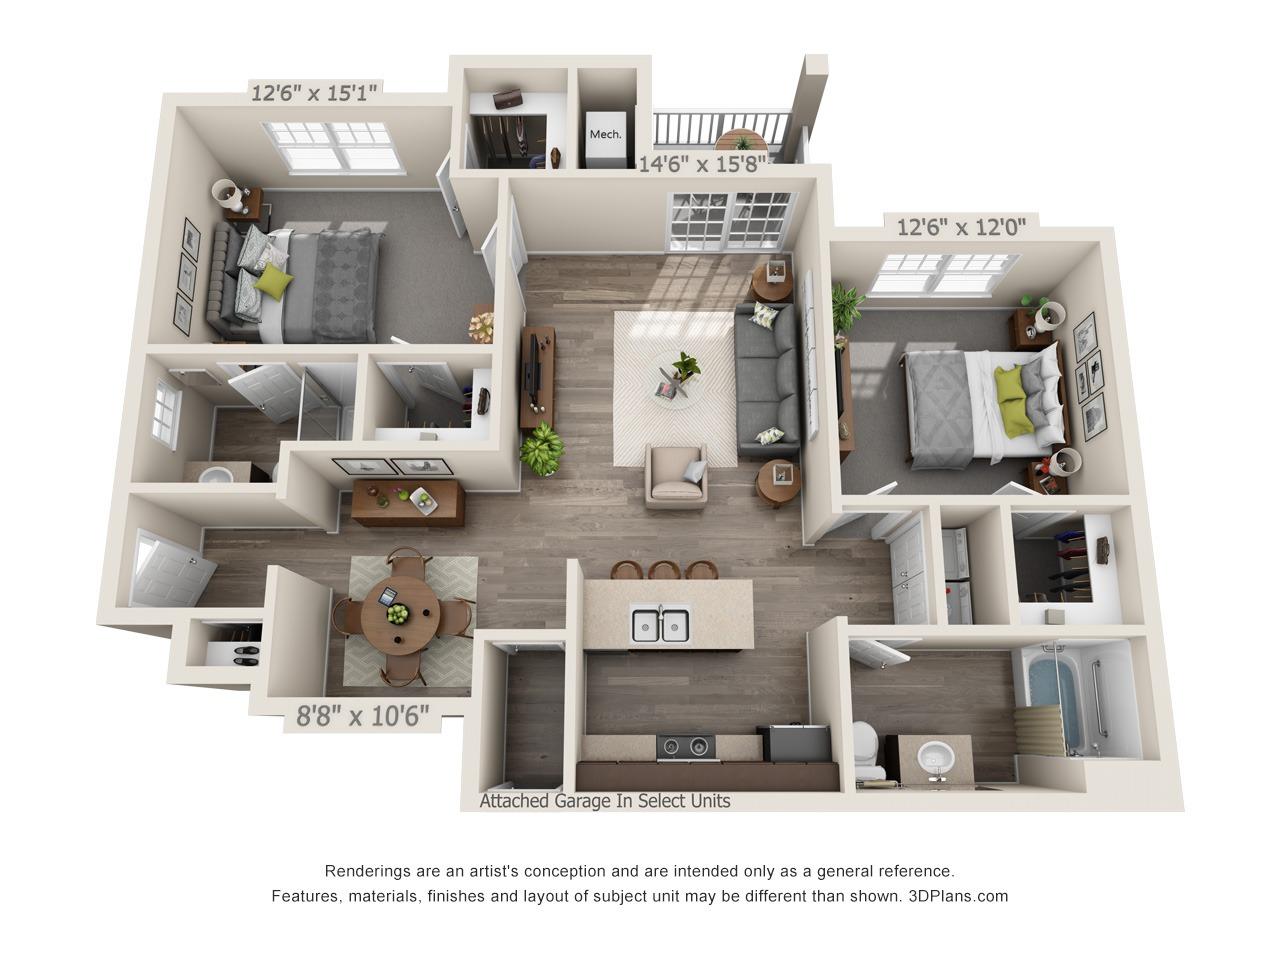 E1 - 2 Bed / 2 Bath and Den - 1st Floor - 1,143 SF